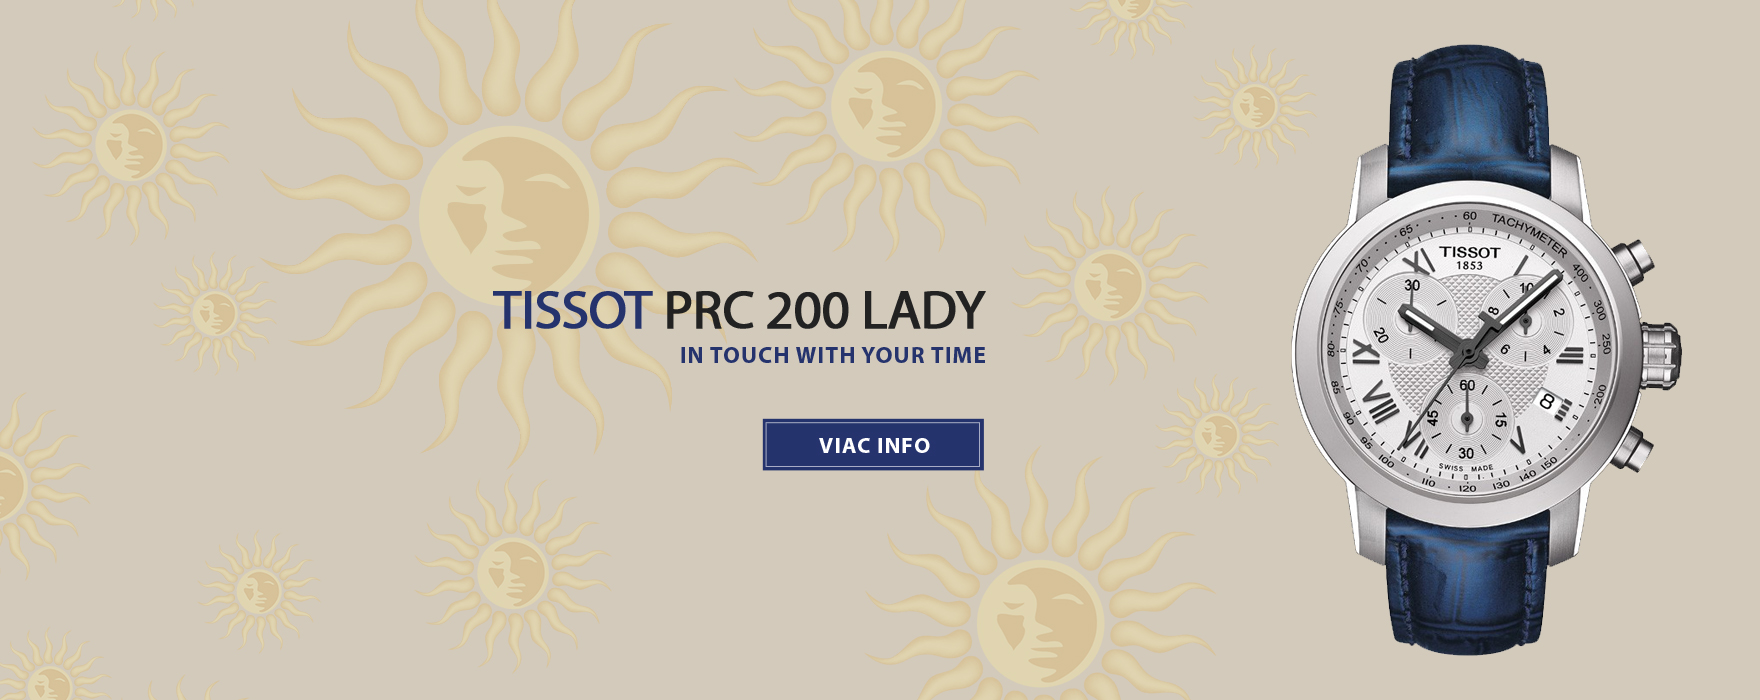 Tissot prc 200 lady